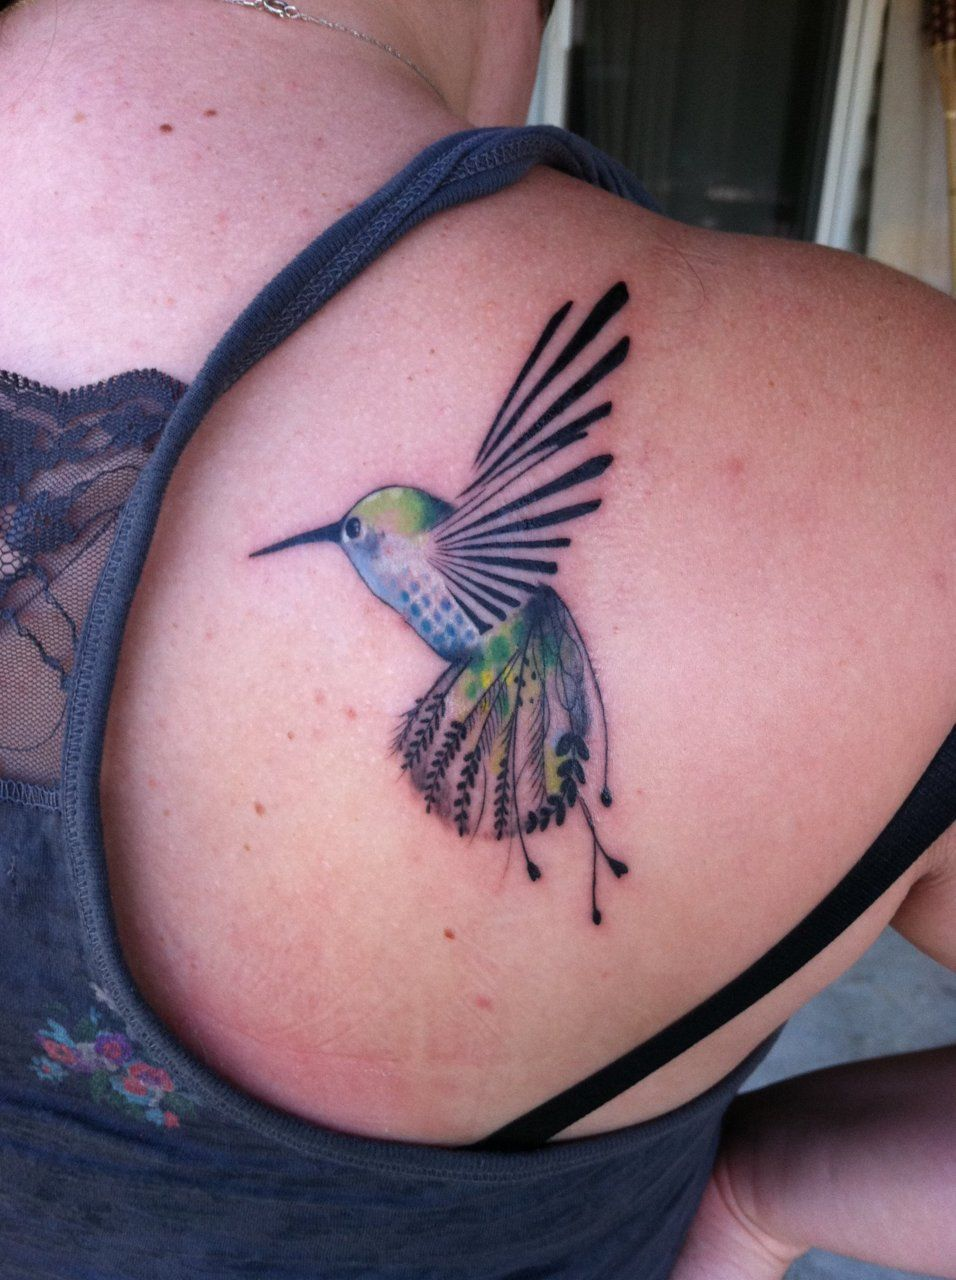 Hummingbird Tattoos, Inspirational tattoos, Hummingbird